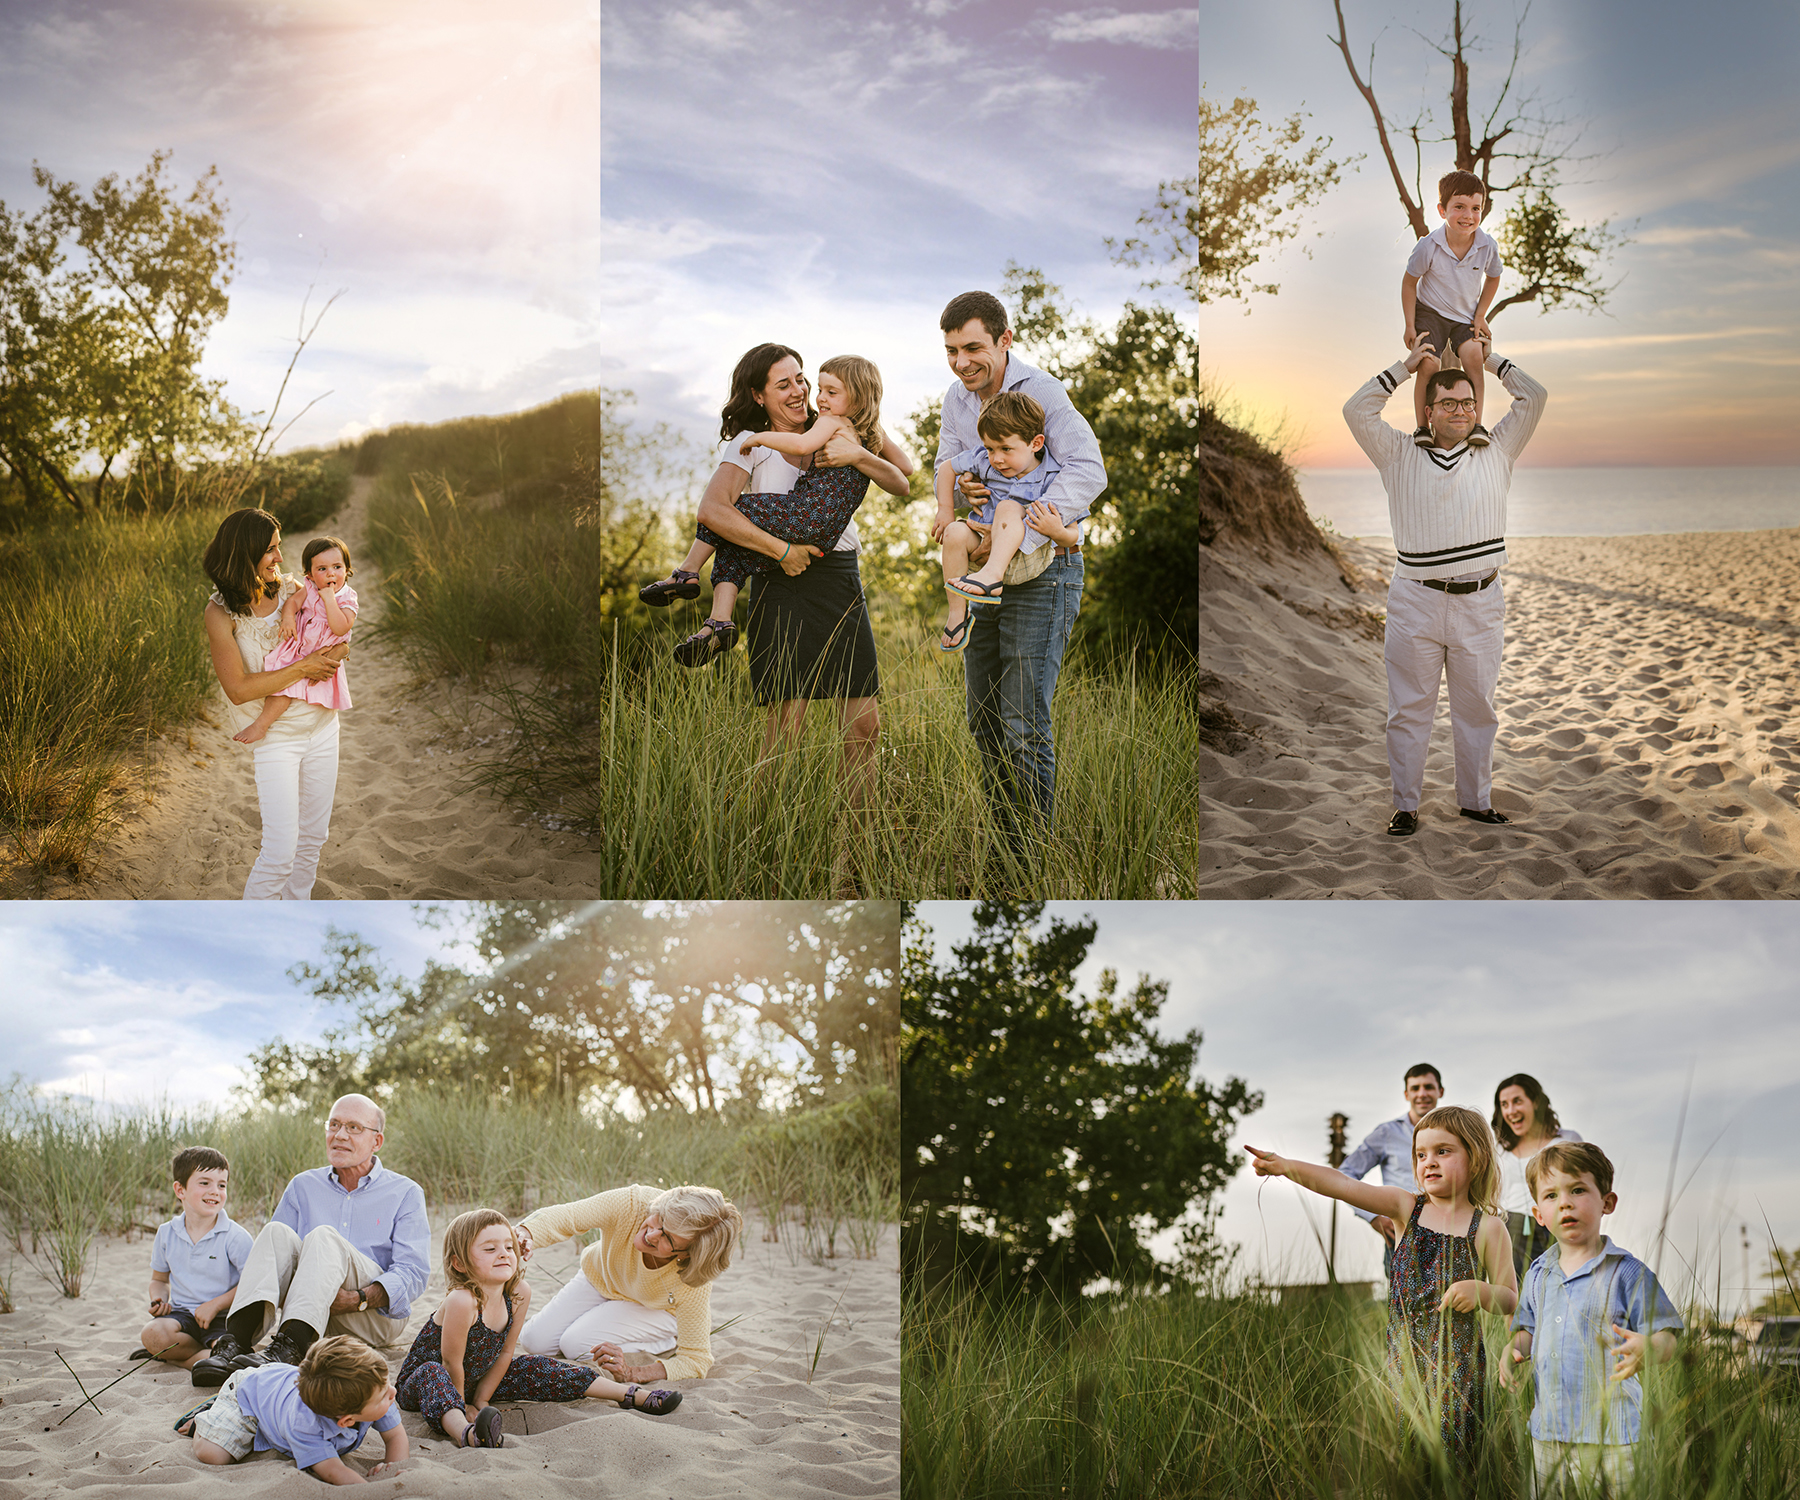 003 lake-michigan-family-session.jpg